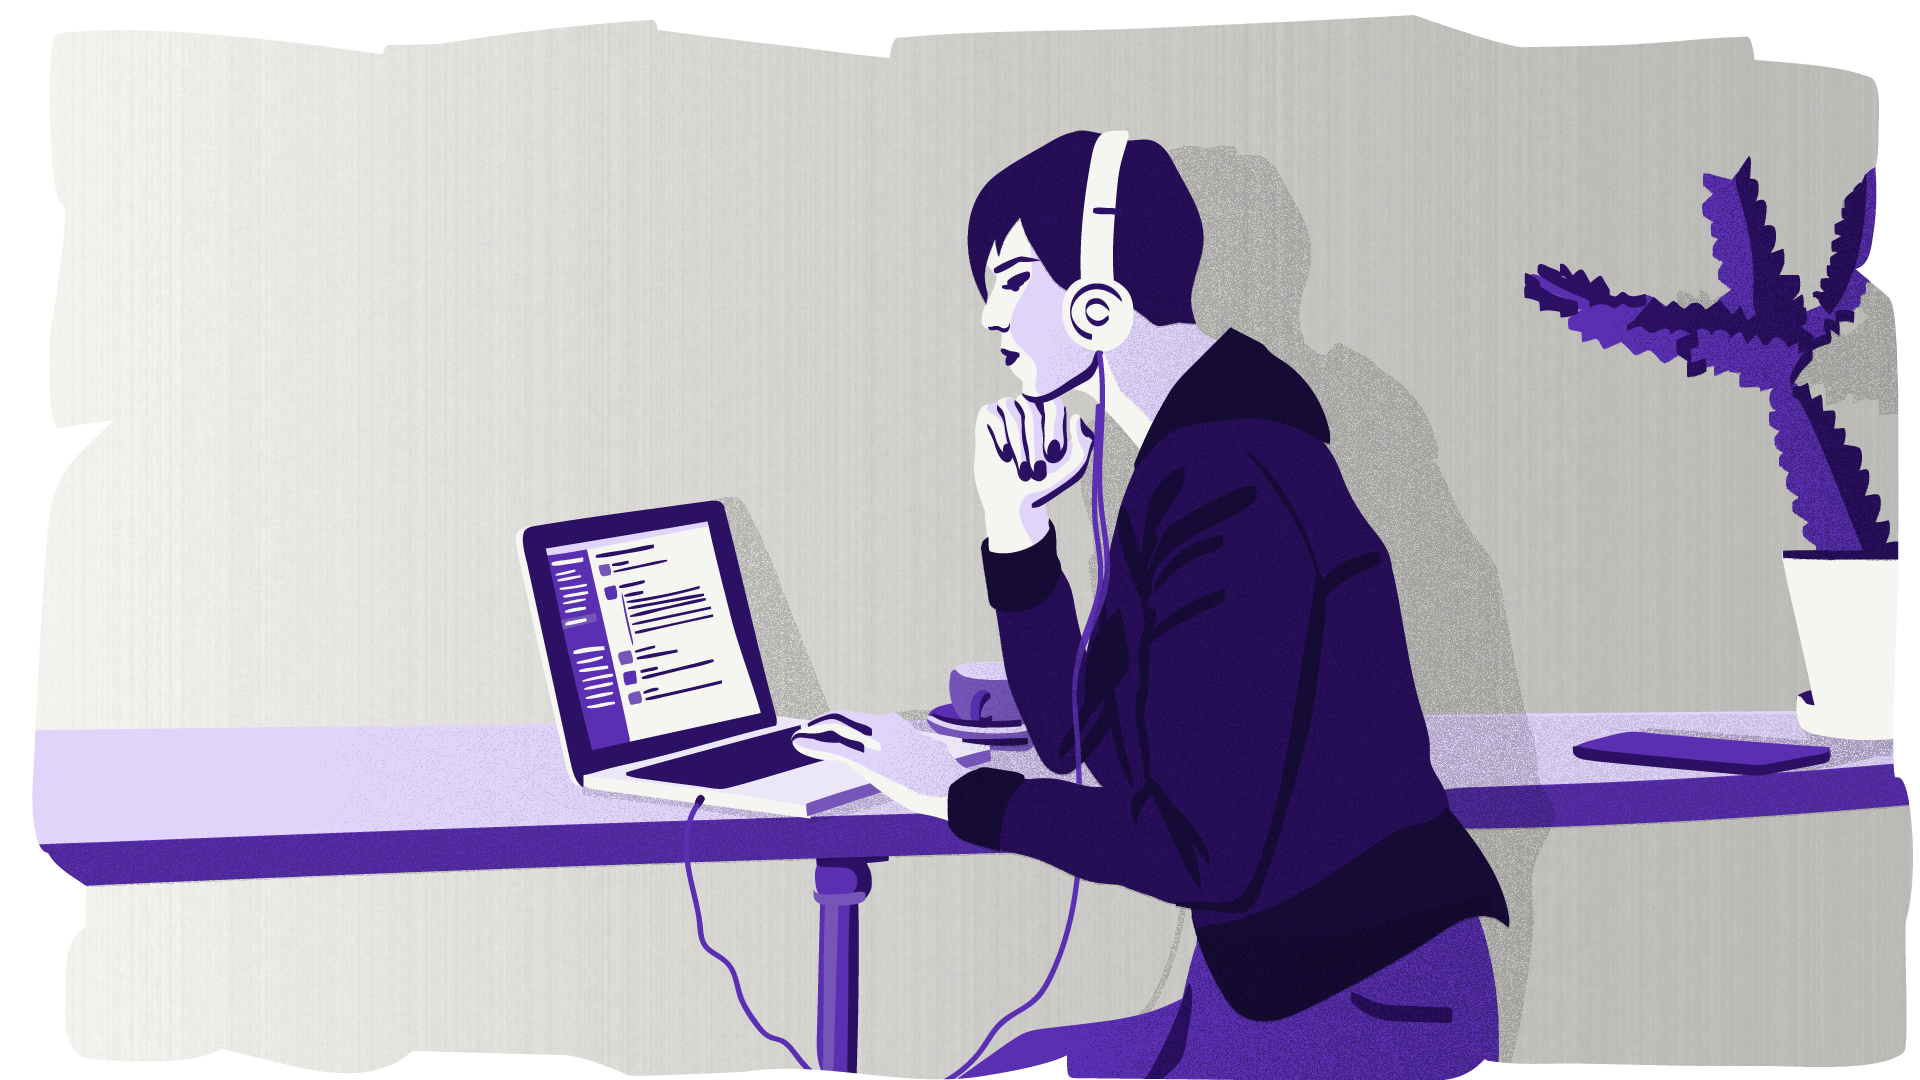 digitaler-wandel-freelancer